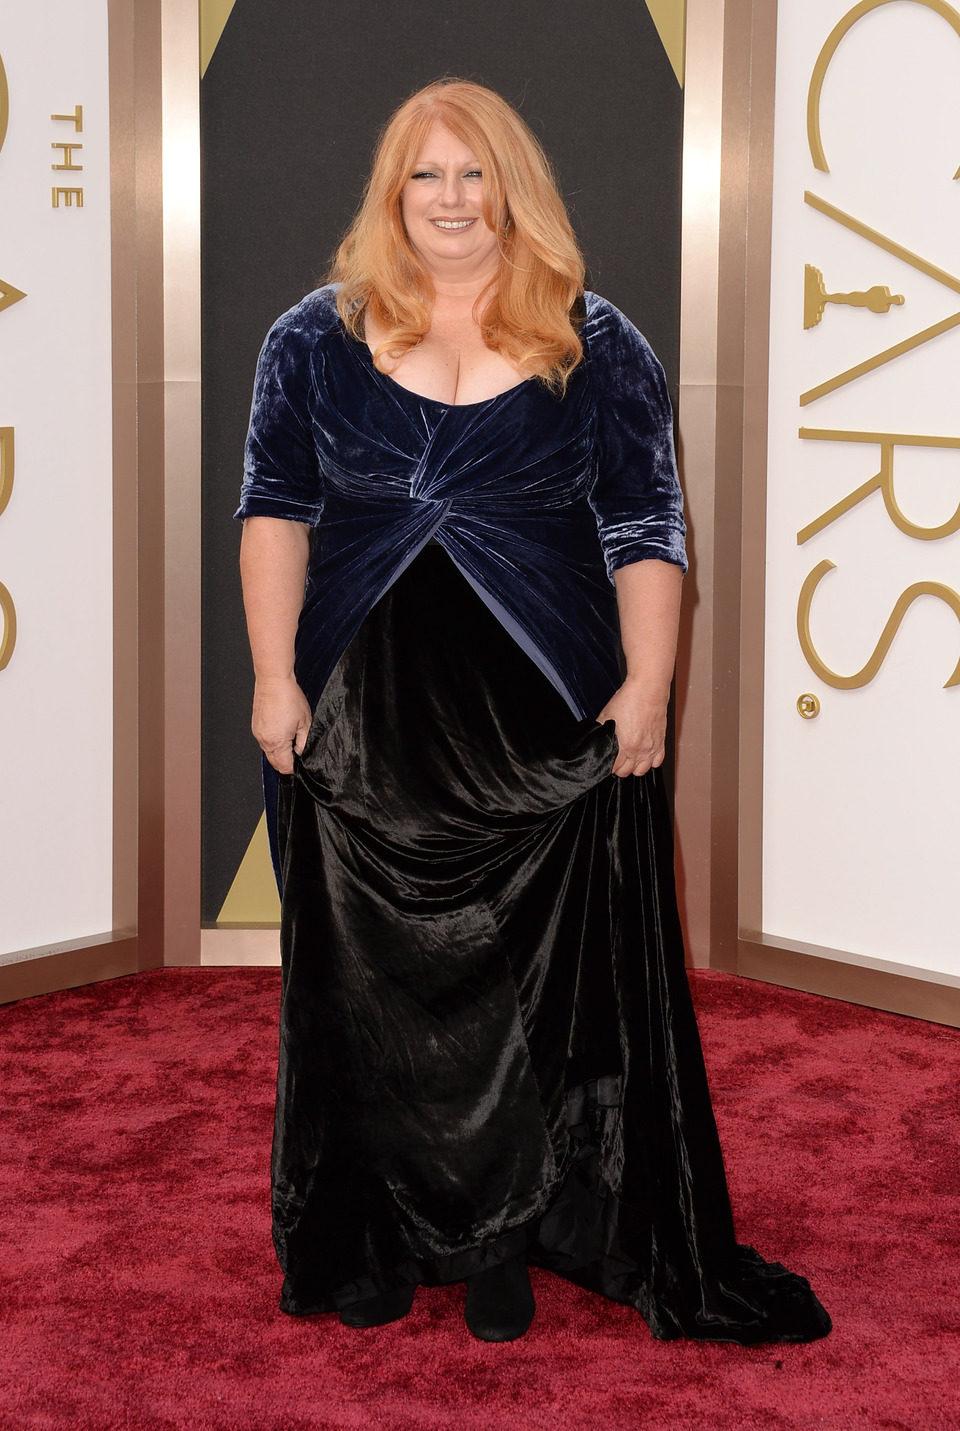 Adruitha Lee at the 2014 Oscars